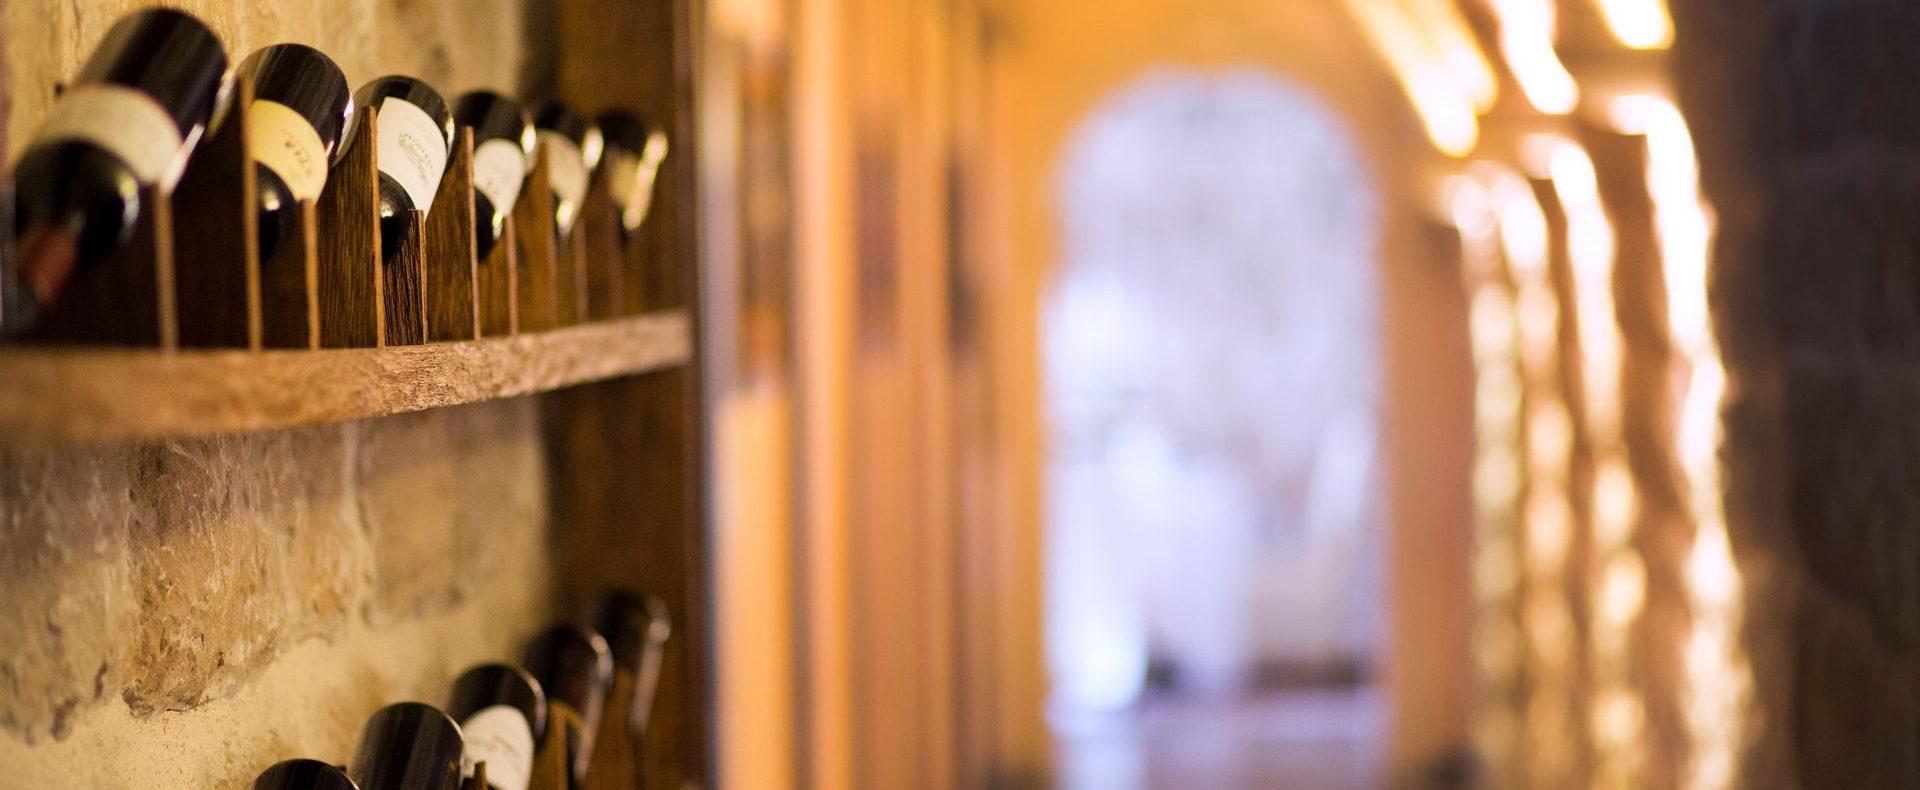 Wine tasting in wine cellars Dubrovnik holiday villa